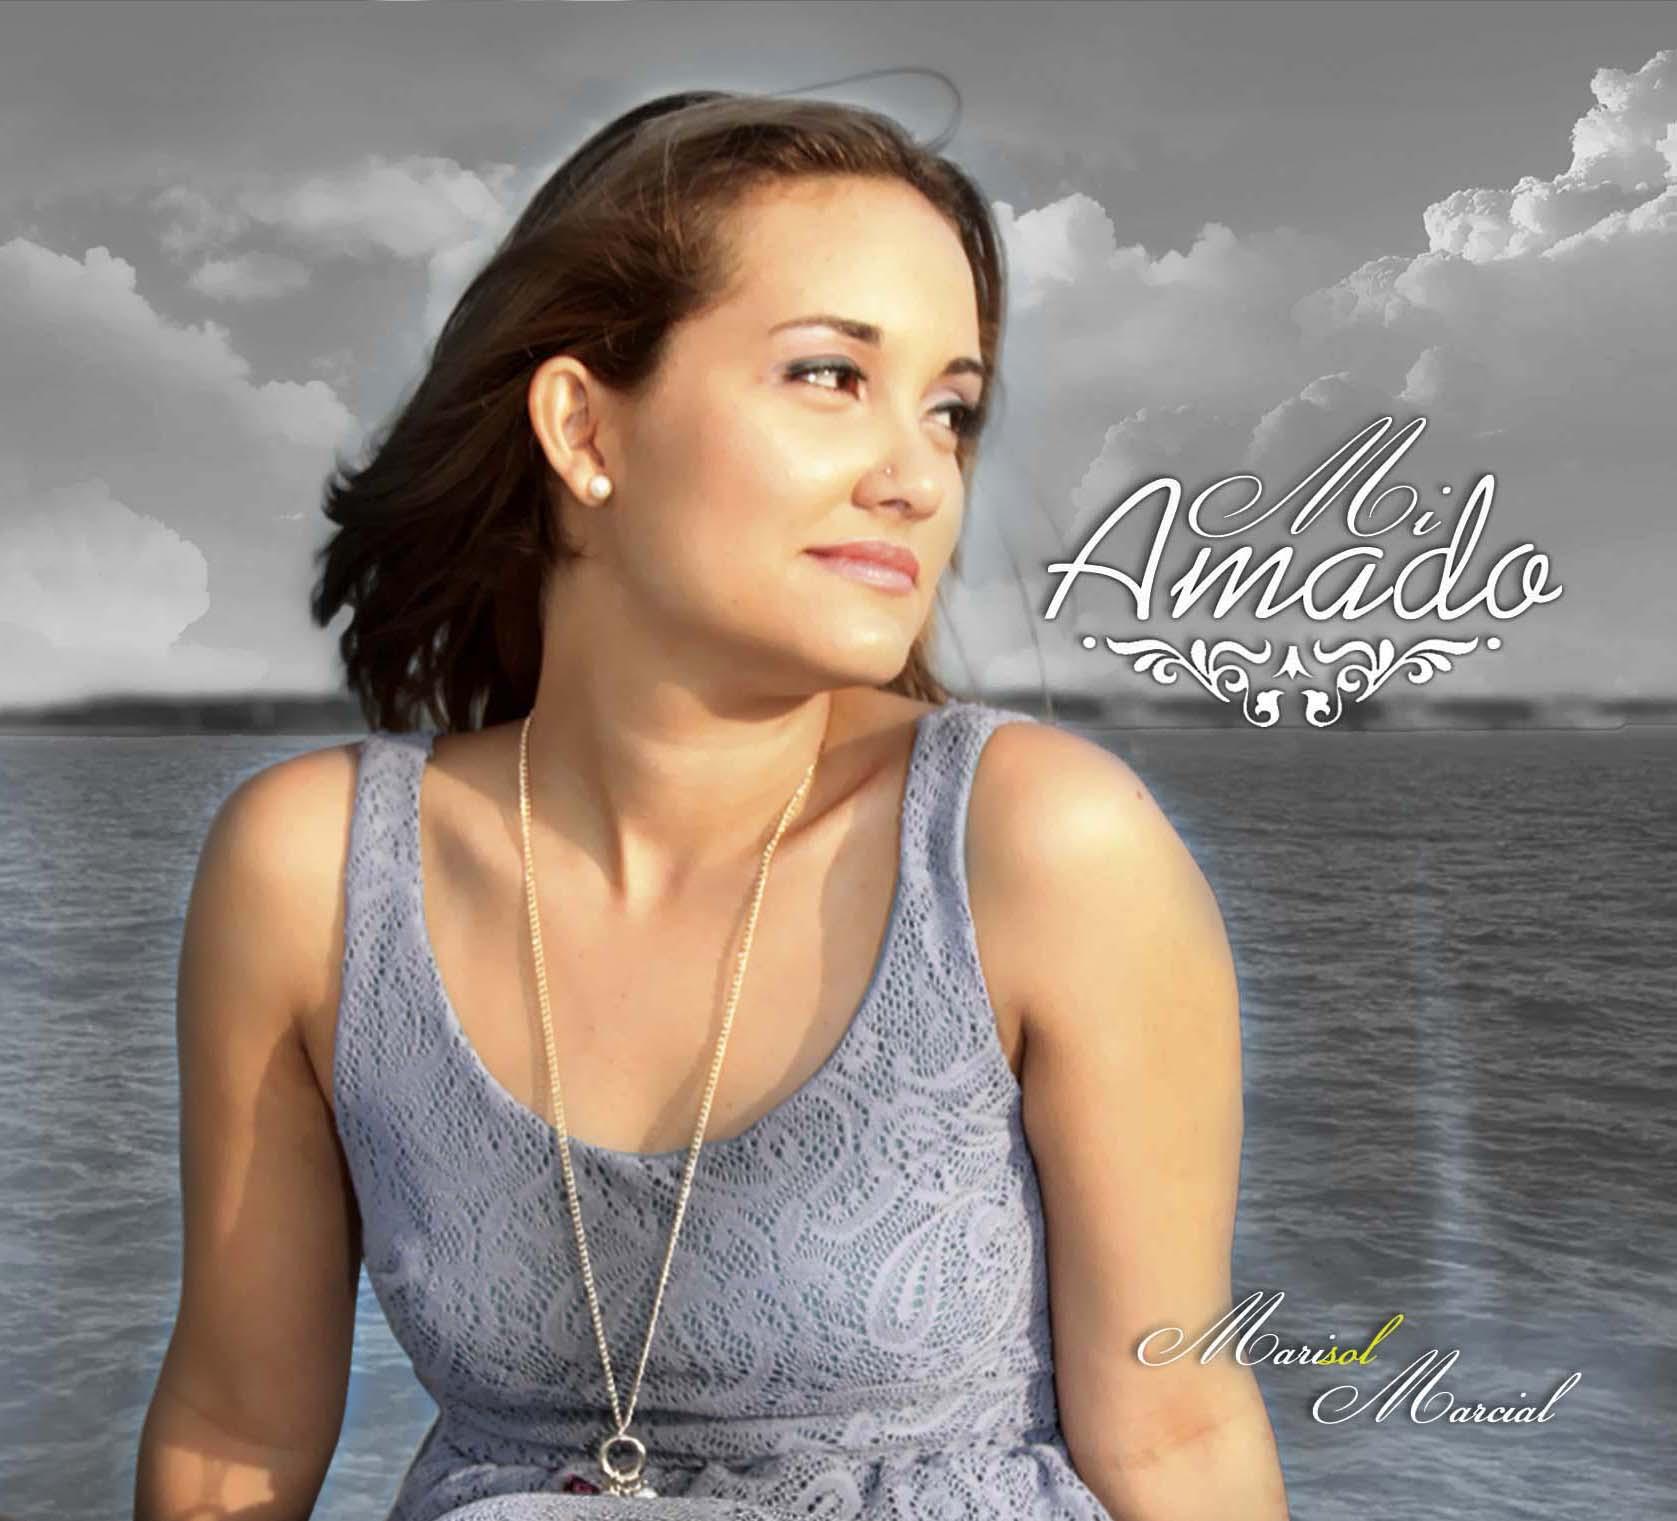 Marisol Marcial Front cd.jpg